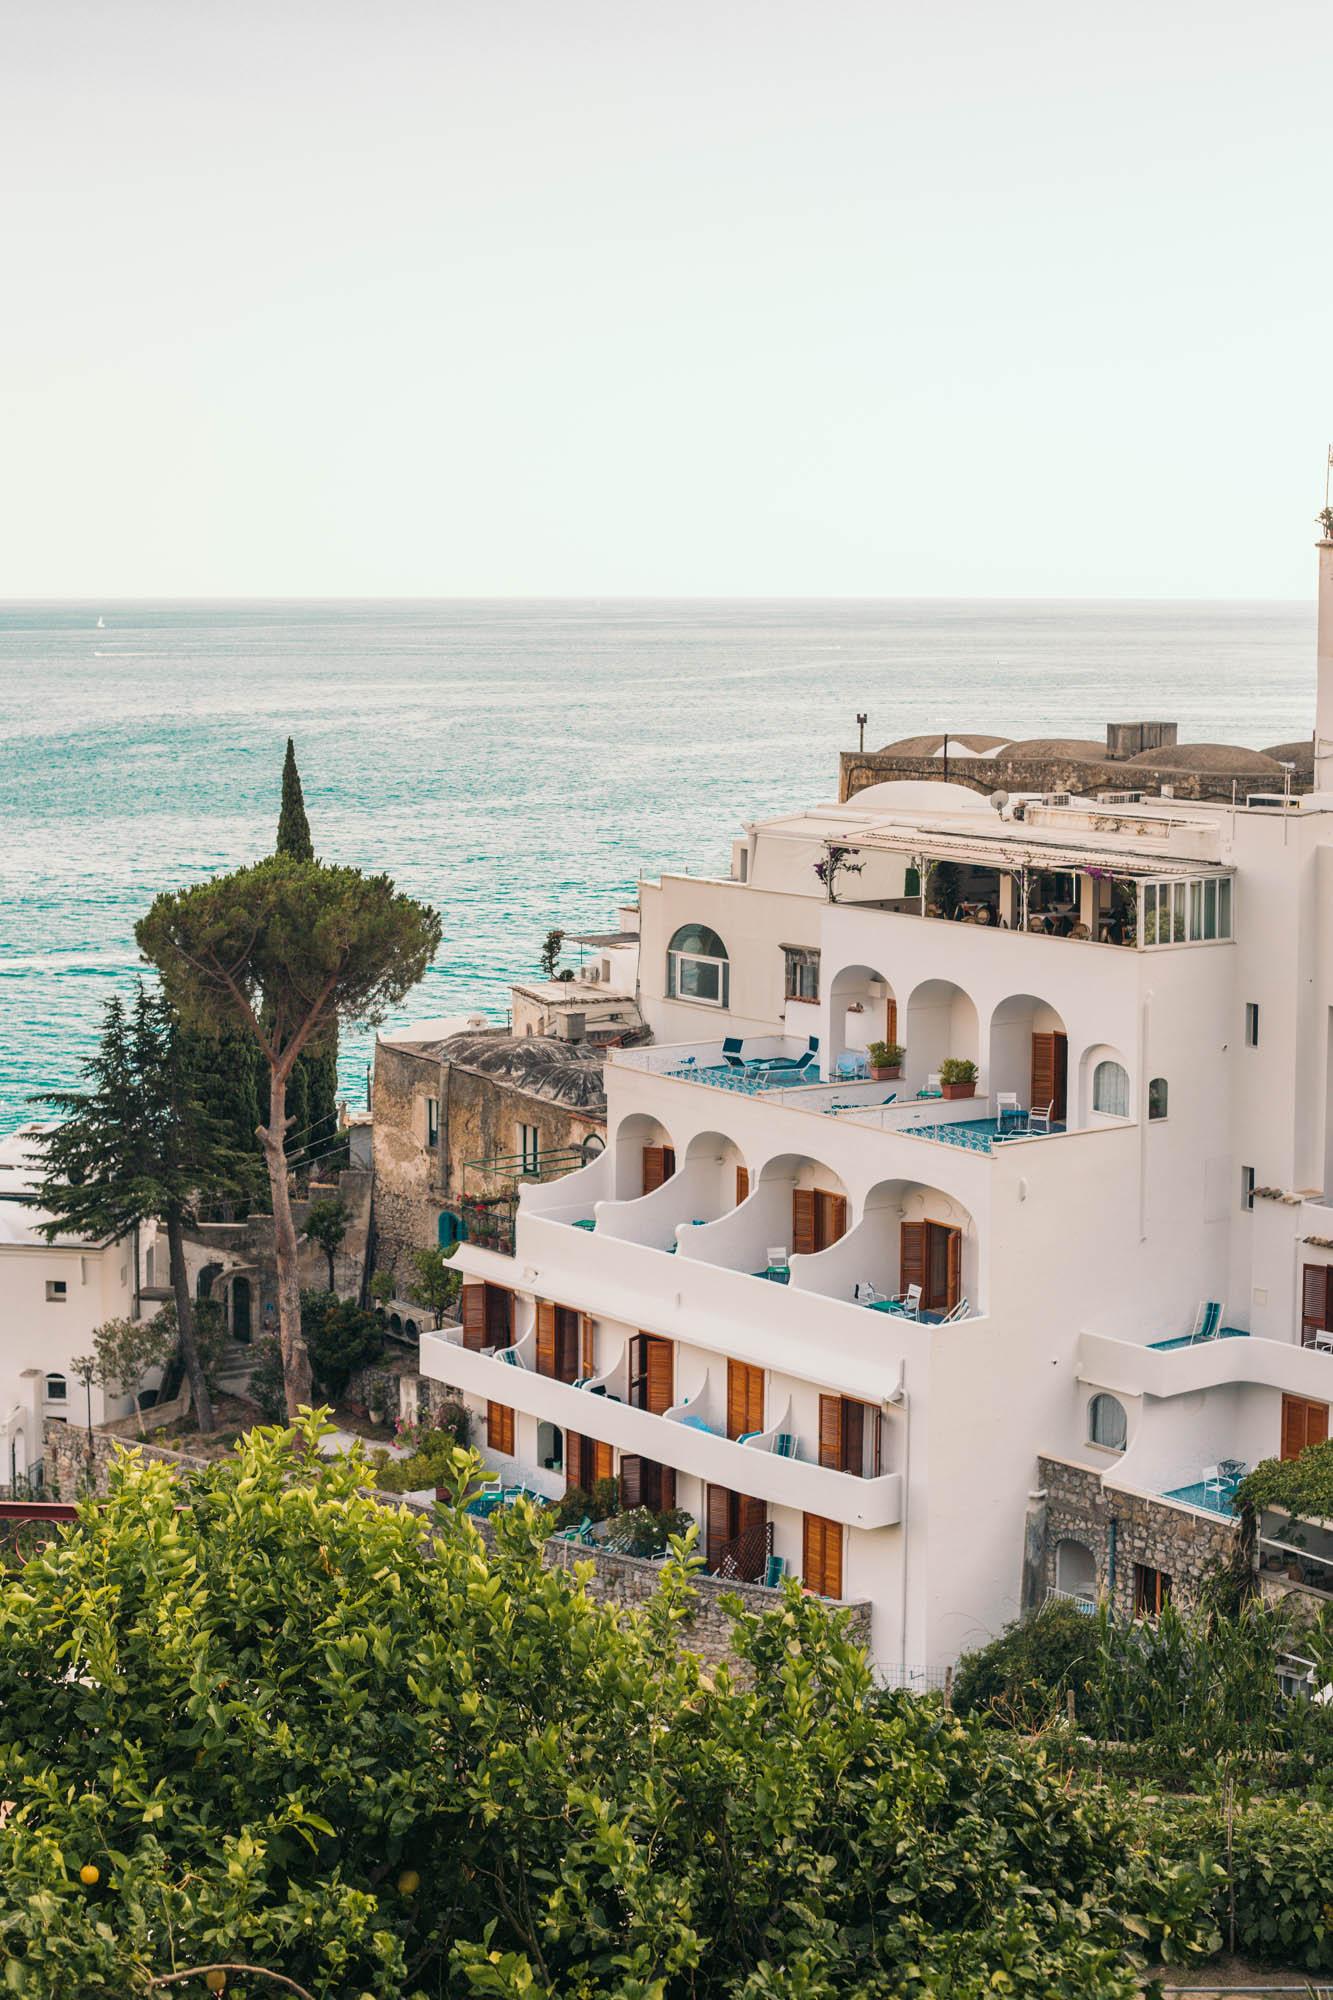 Roadtripping the Amalfi coast – Positano